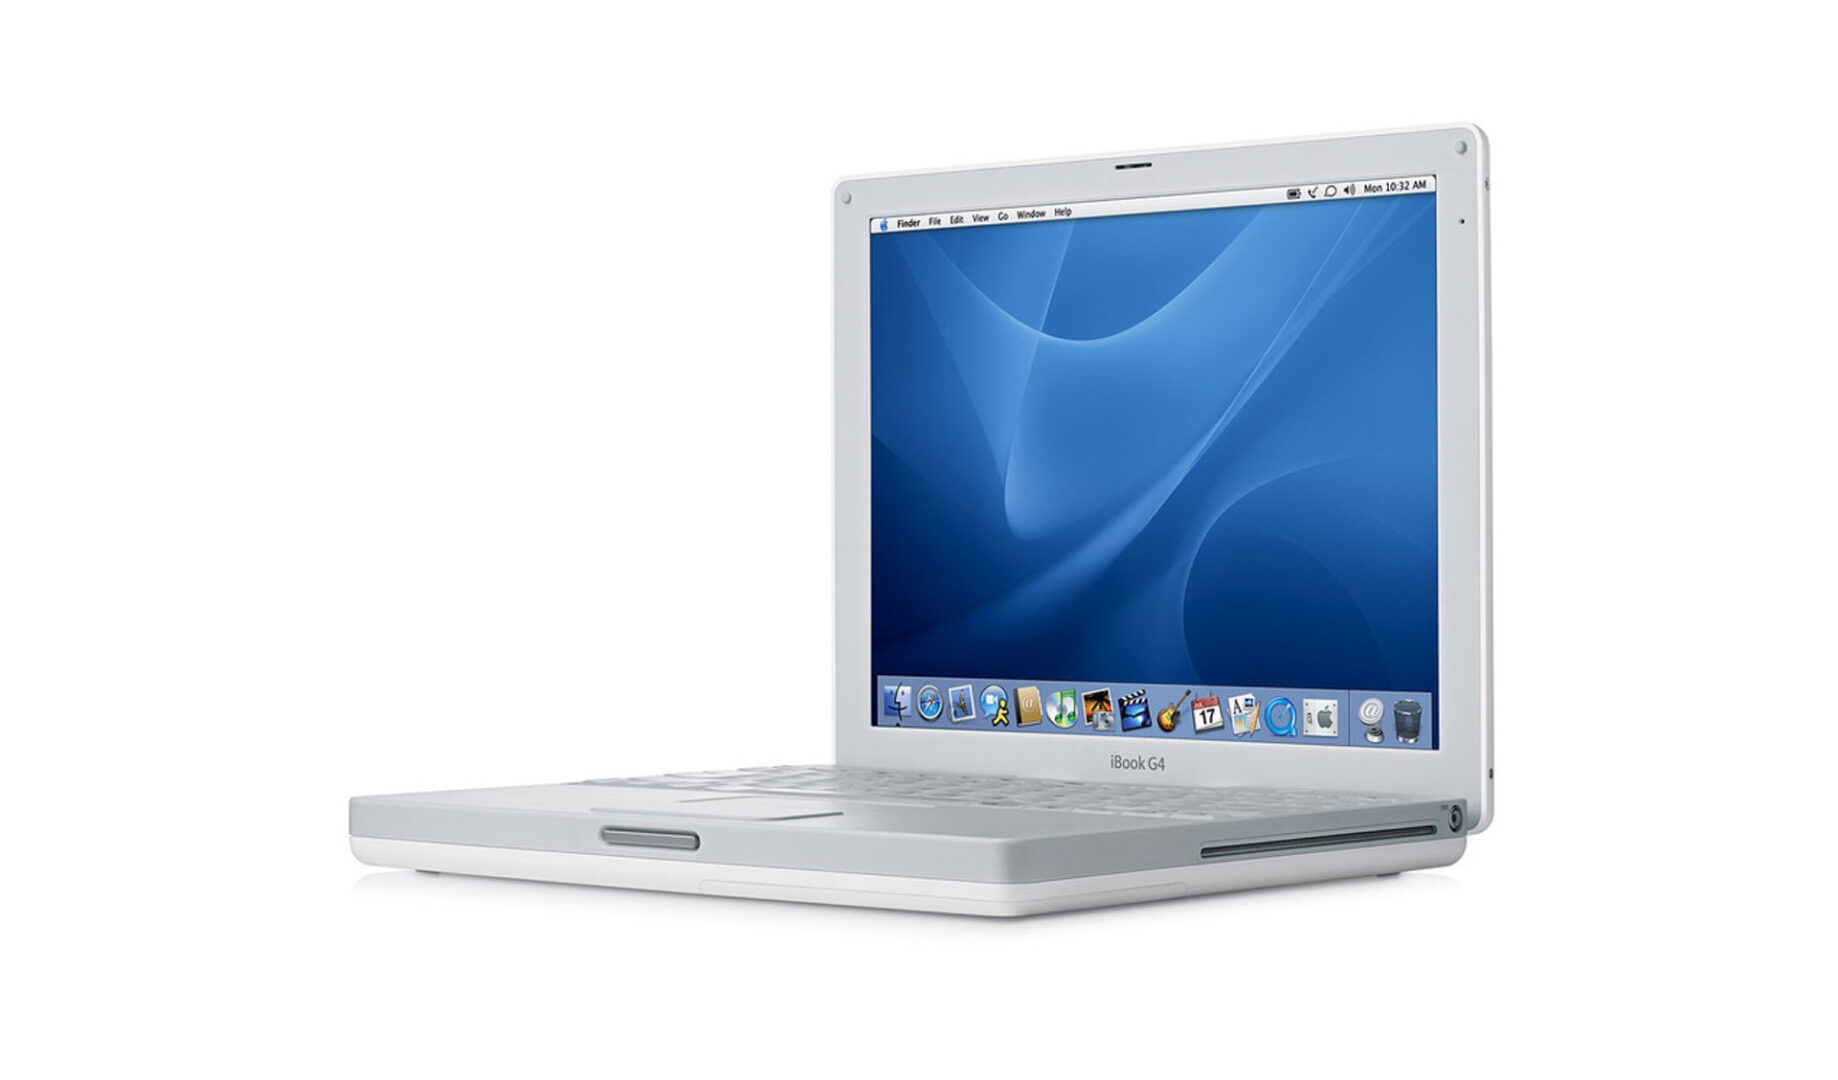 iBook G4 12-inch